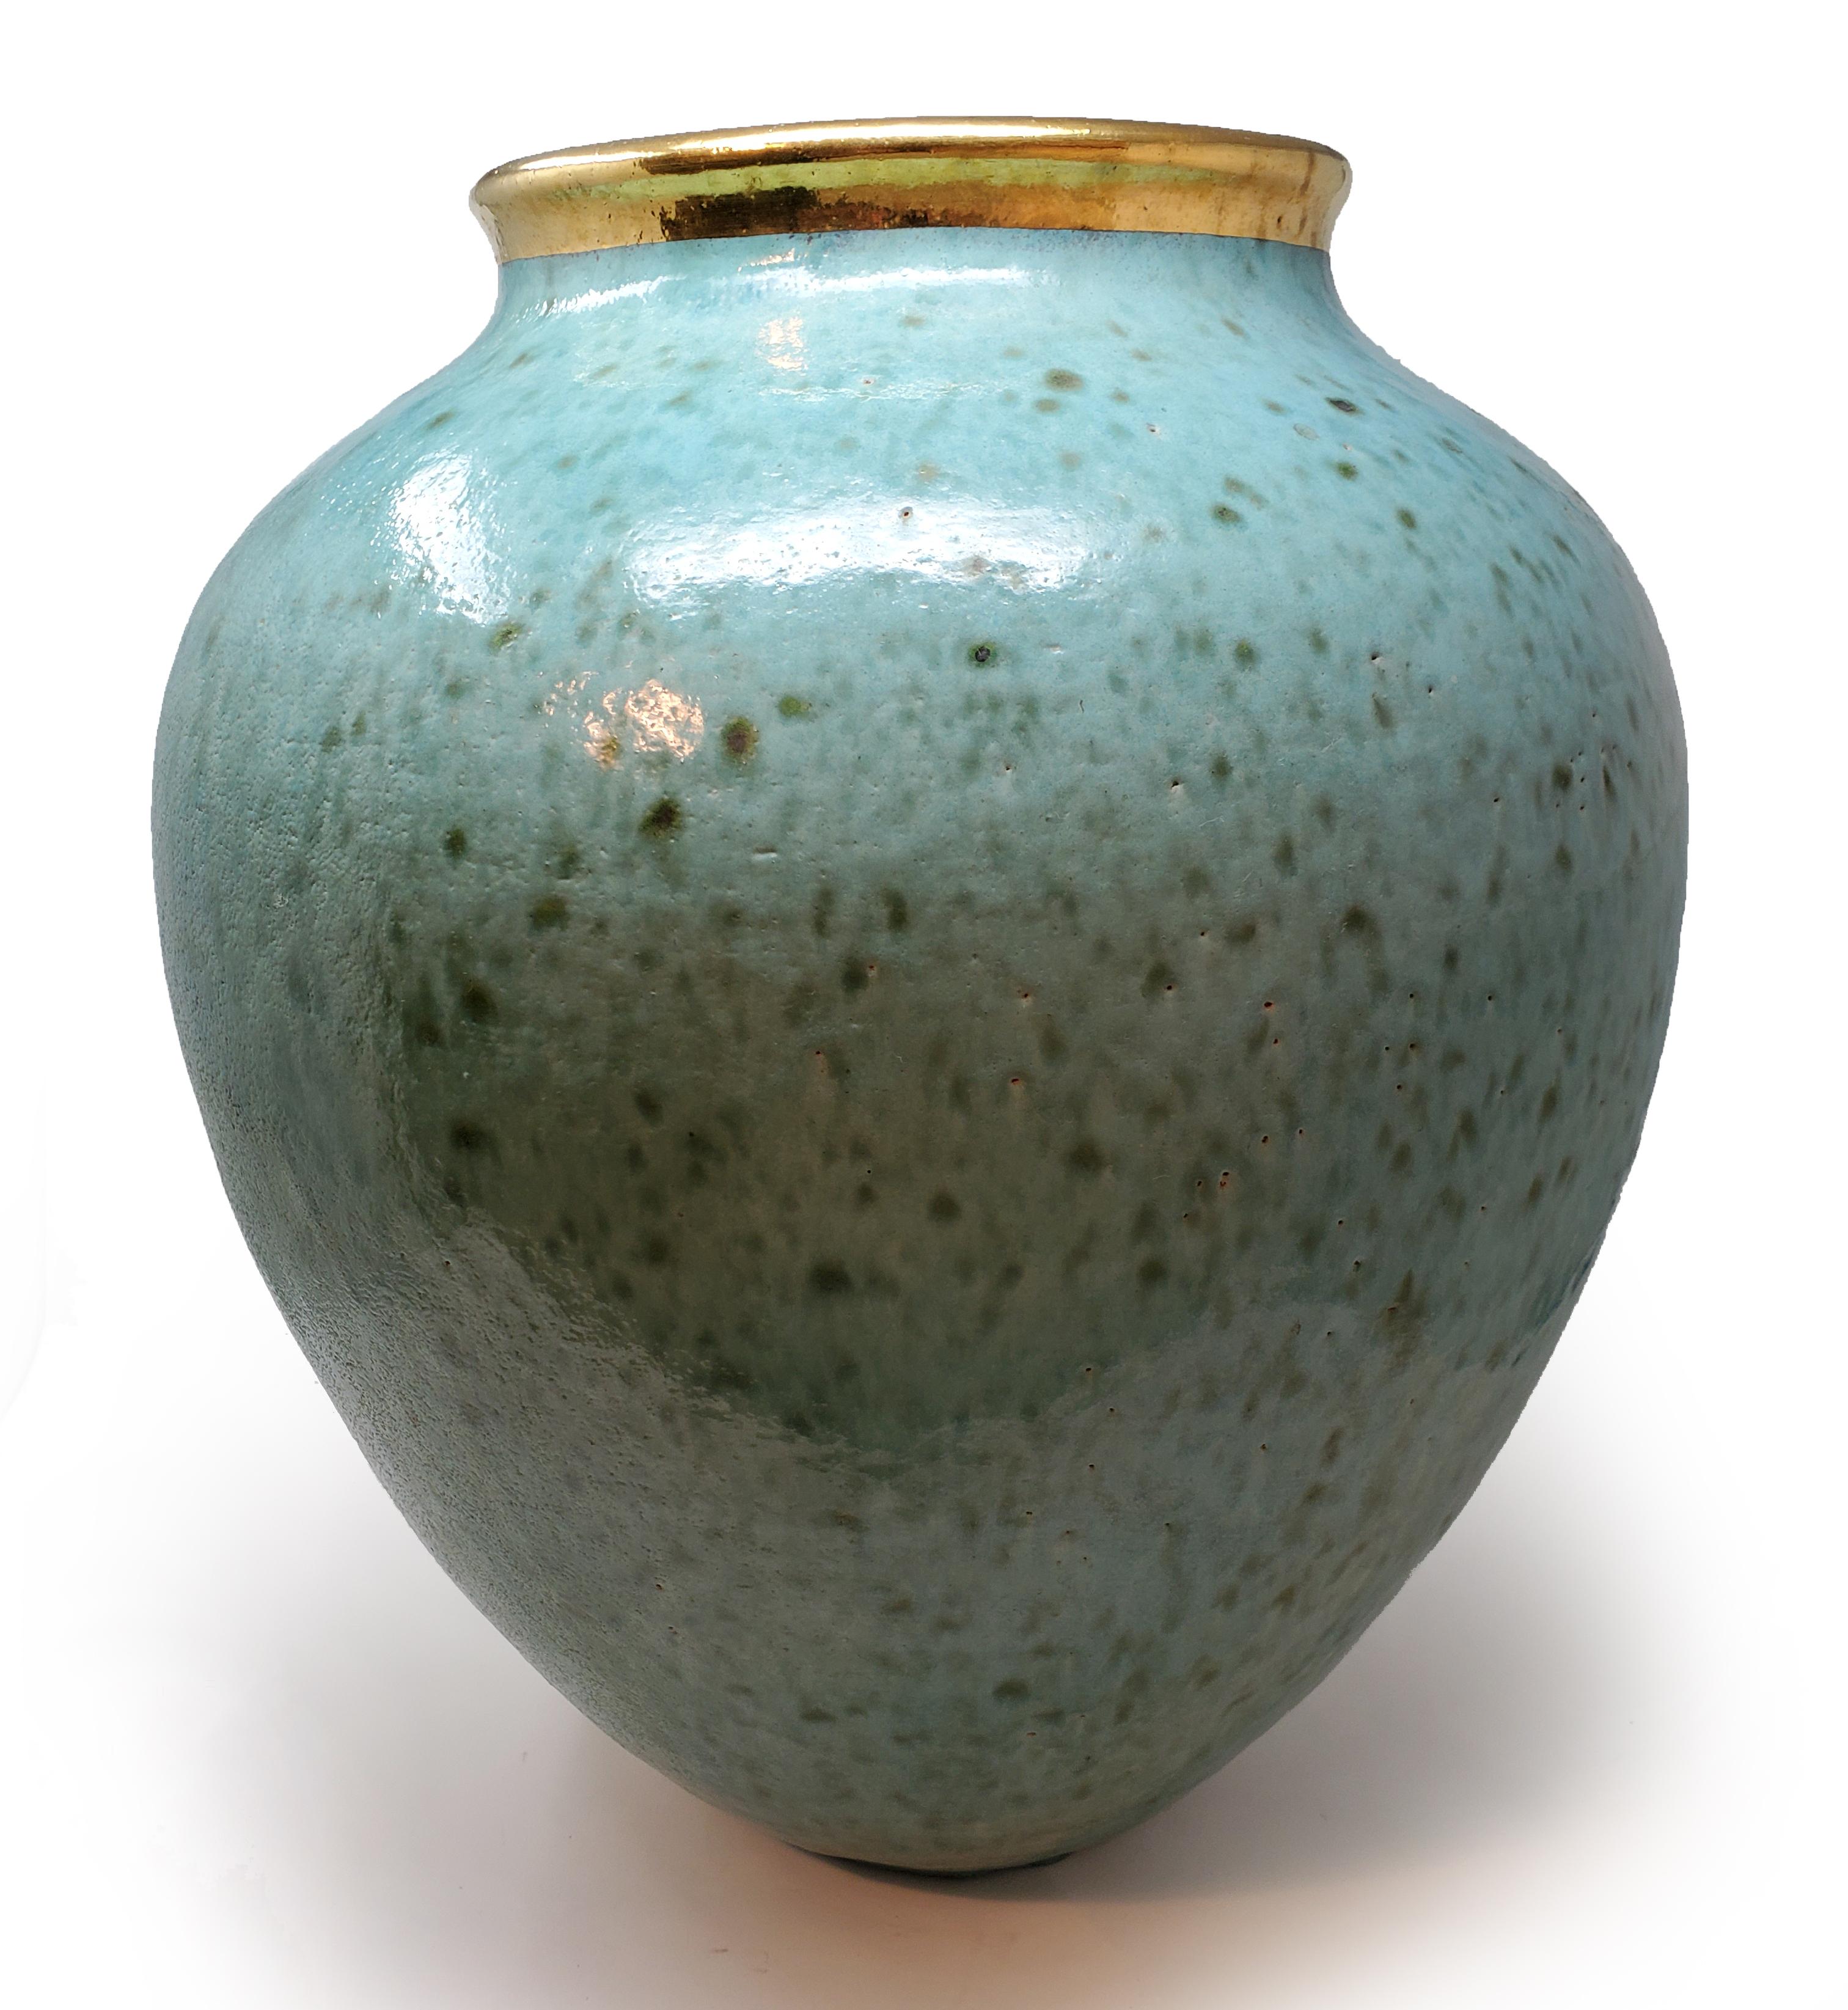 klinsky-vase-lg.jpg